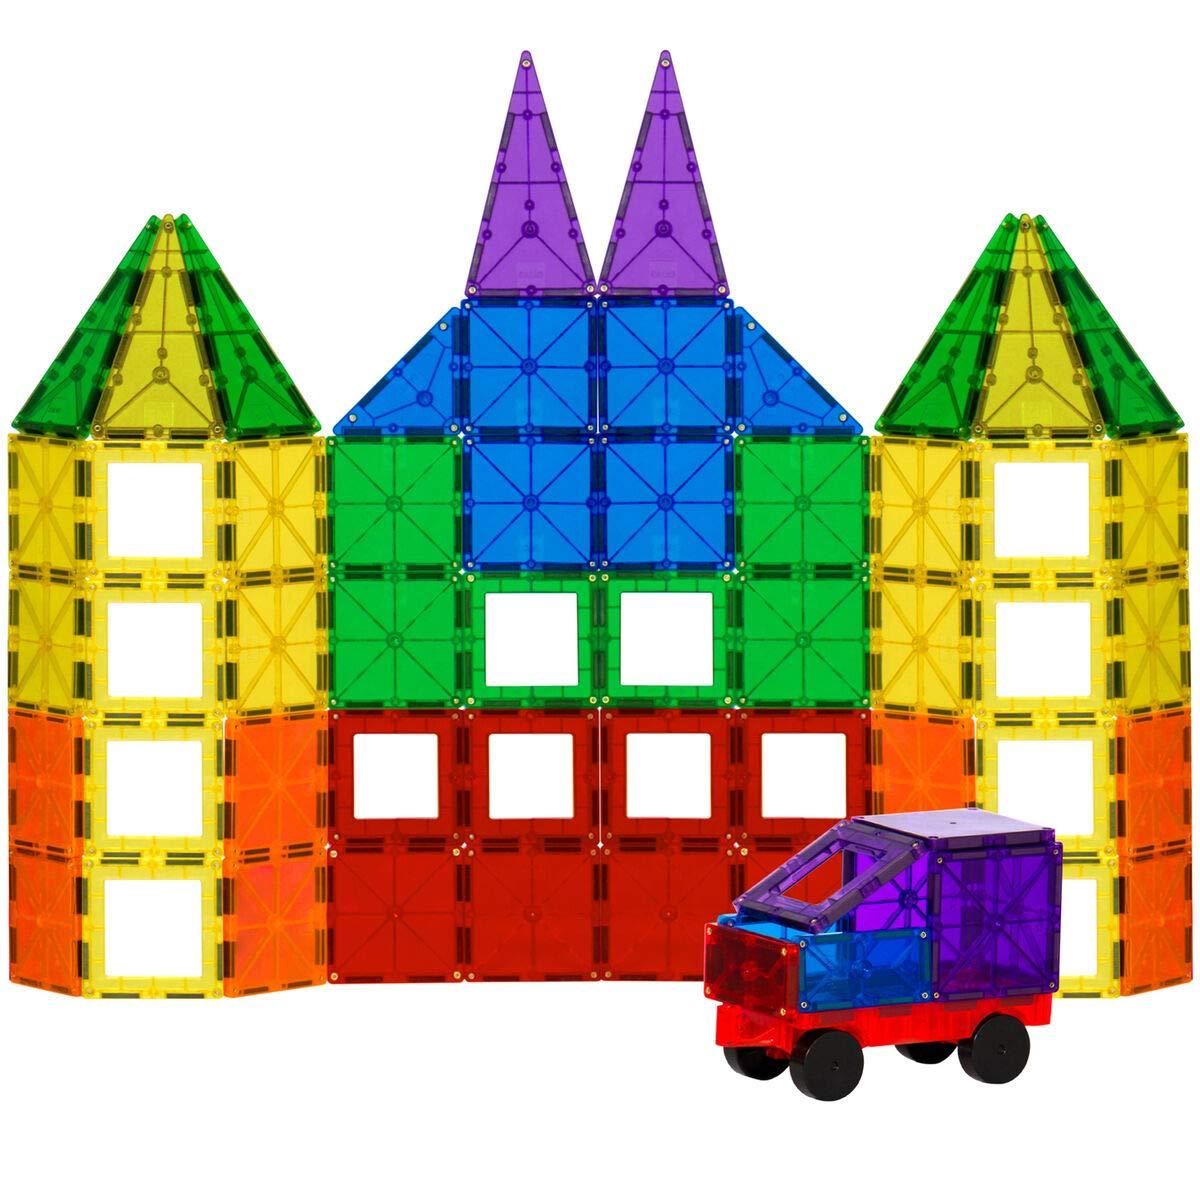 100-Piece Kids Clear Rainbow Magnetic Building Block Tiles Toy Set - Multi, Best Children's Toys 2019